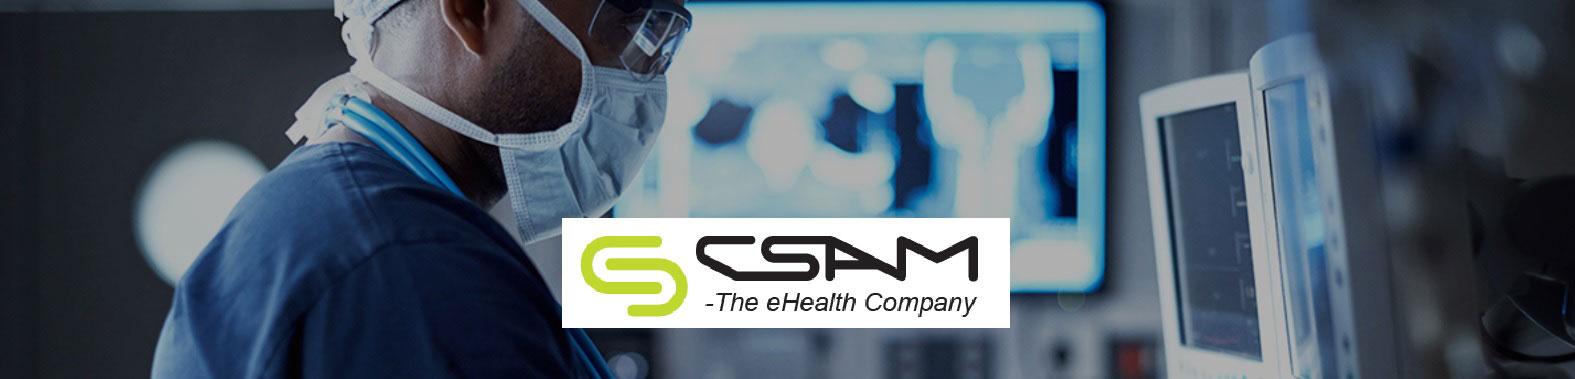 CS-NM-CSAM-hero